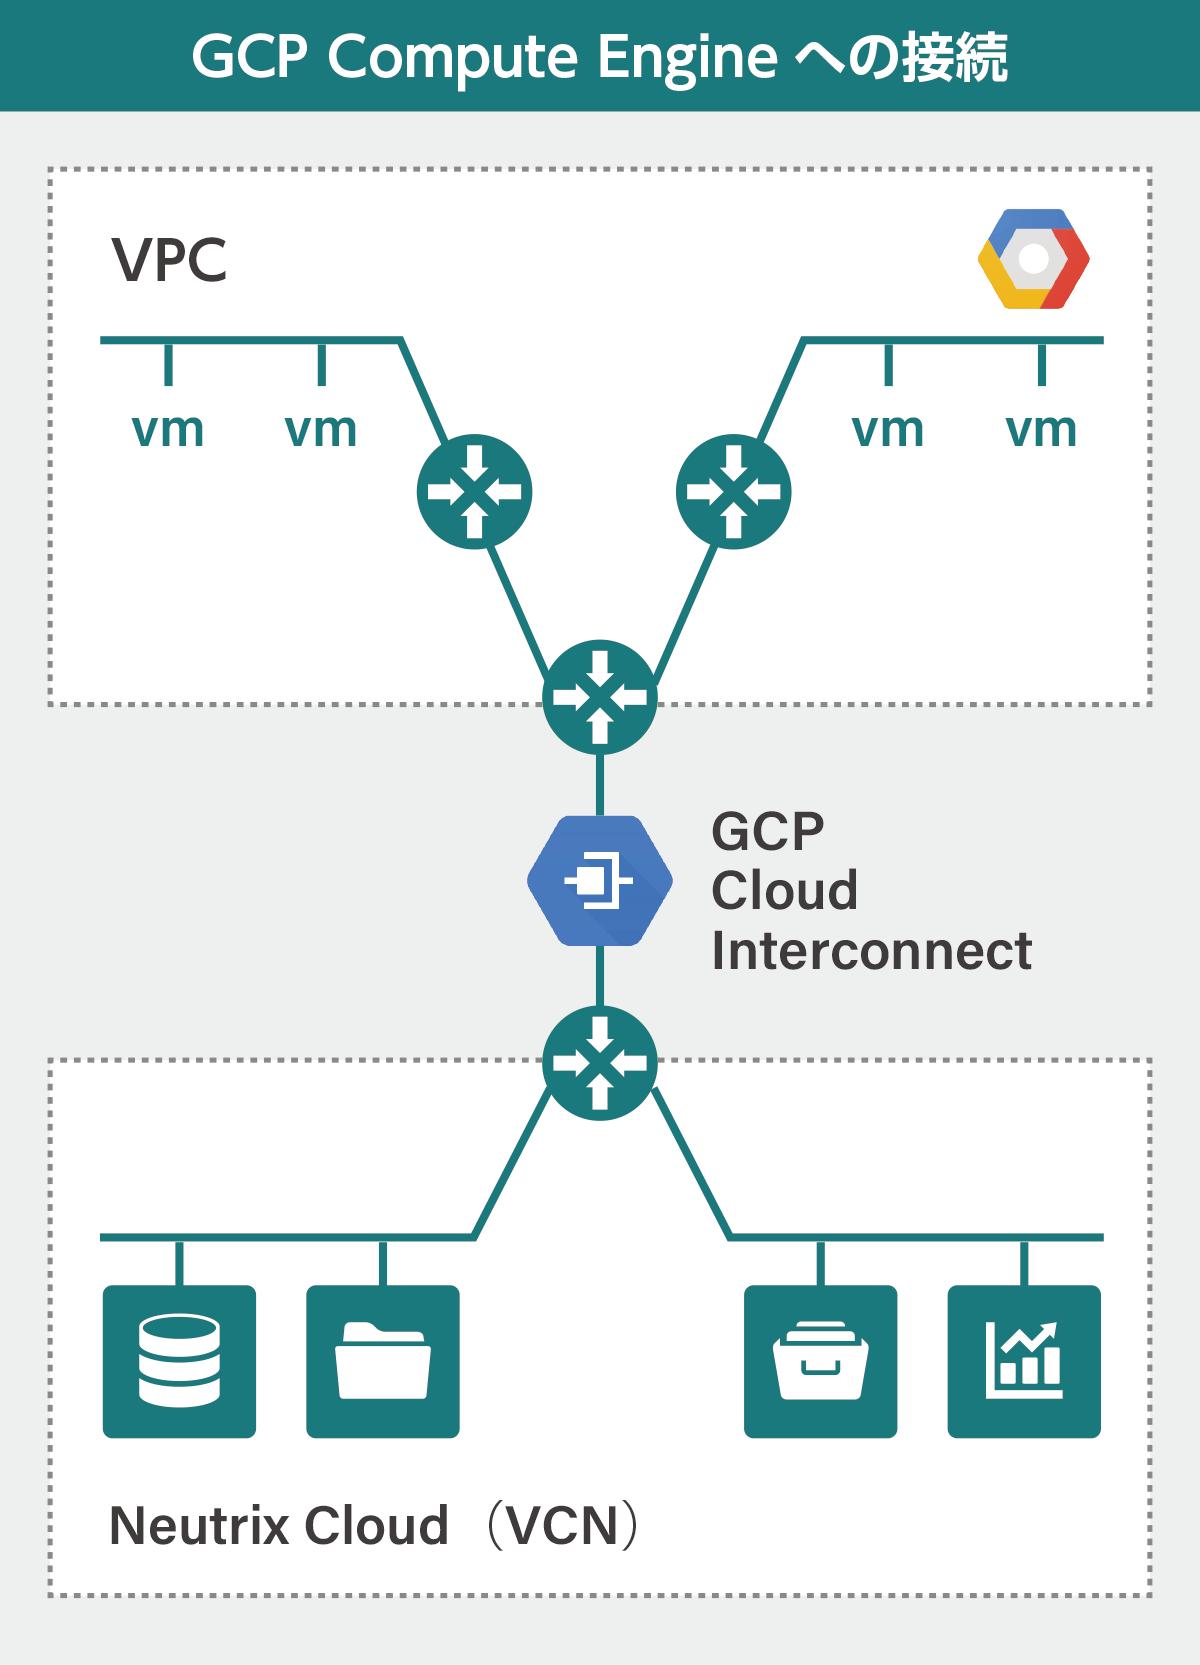 GCP(GCP➡Neutrix Cloud クラウド接続ストレージ)